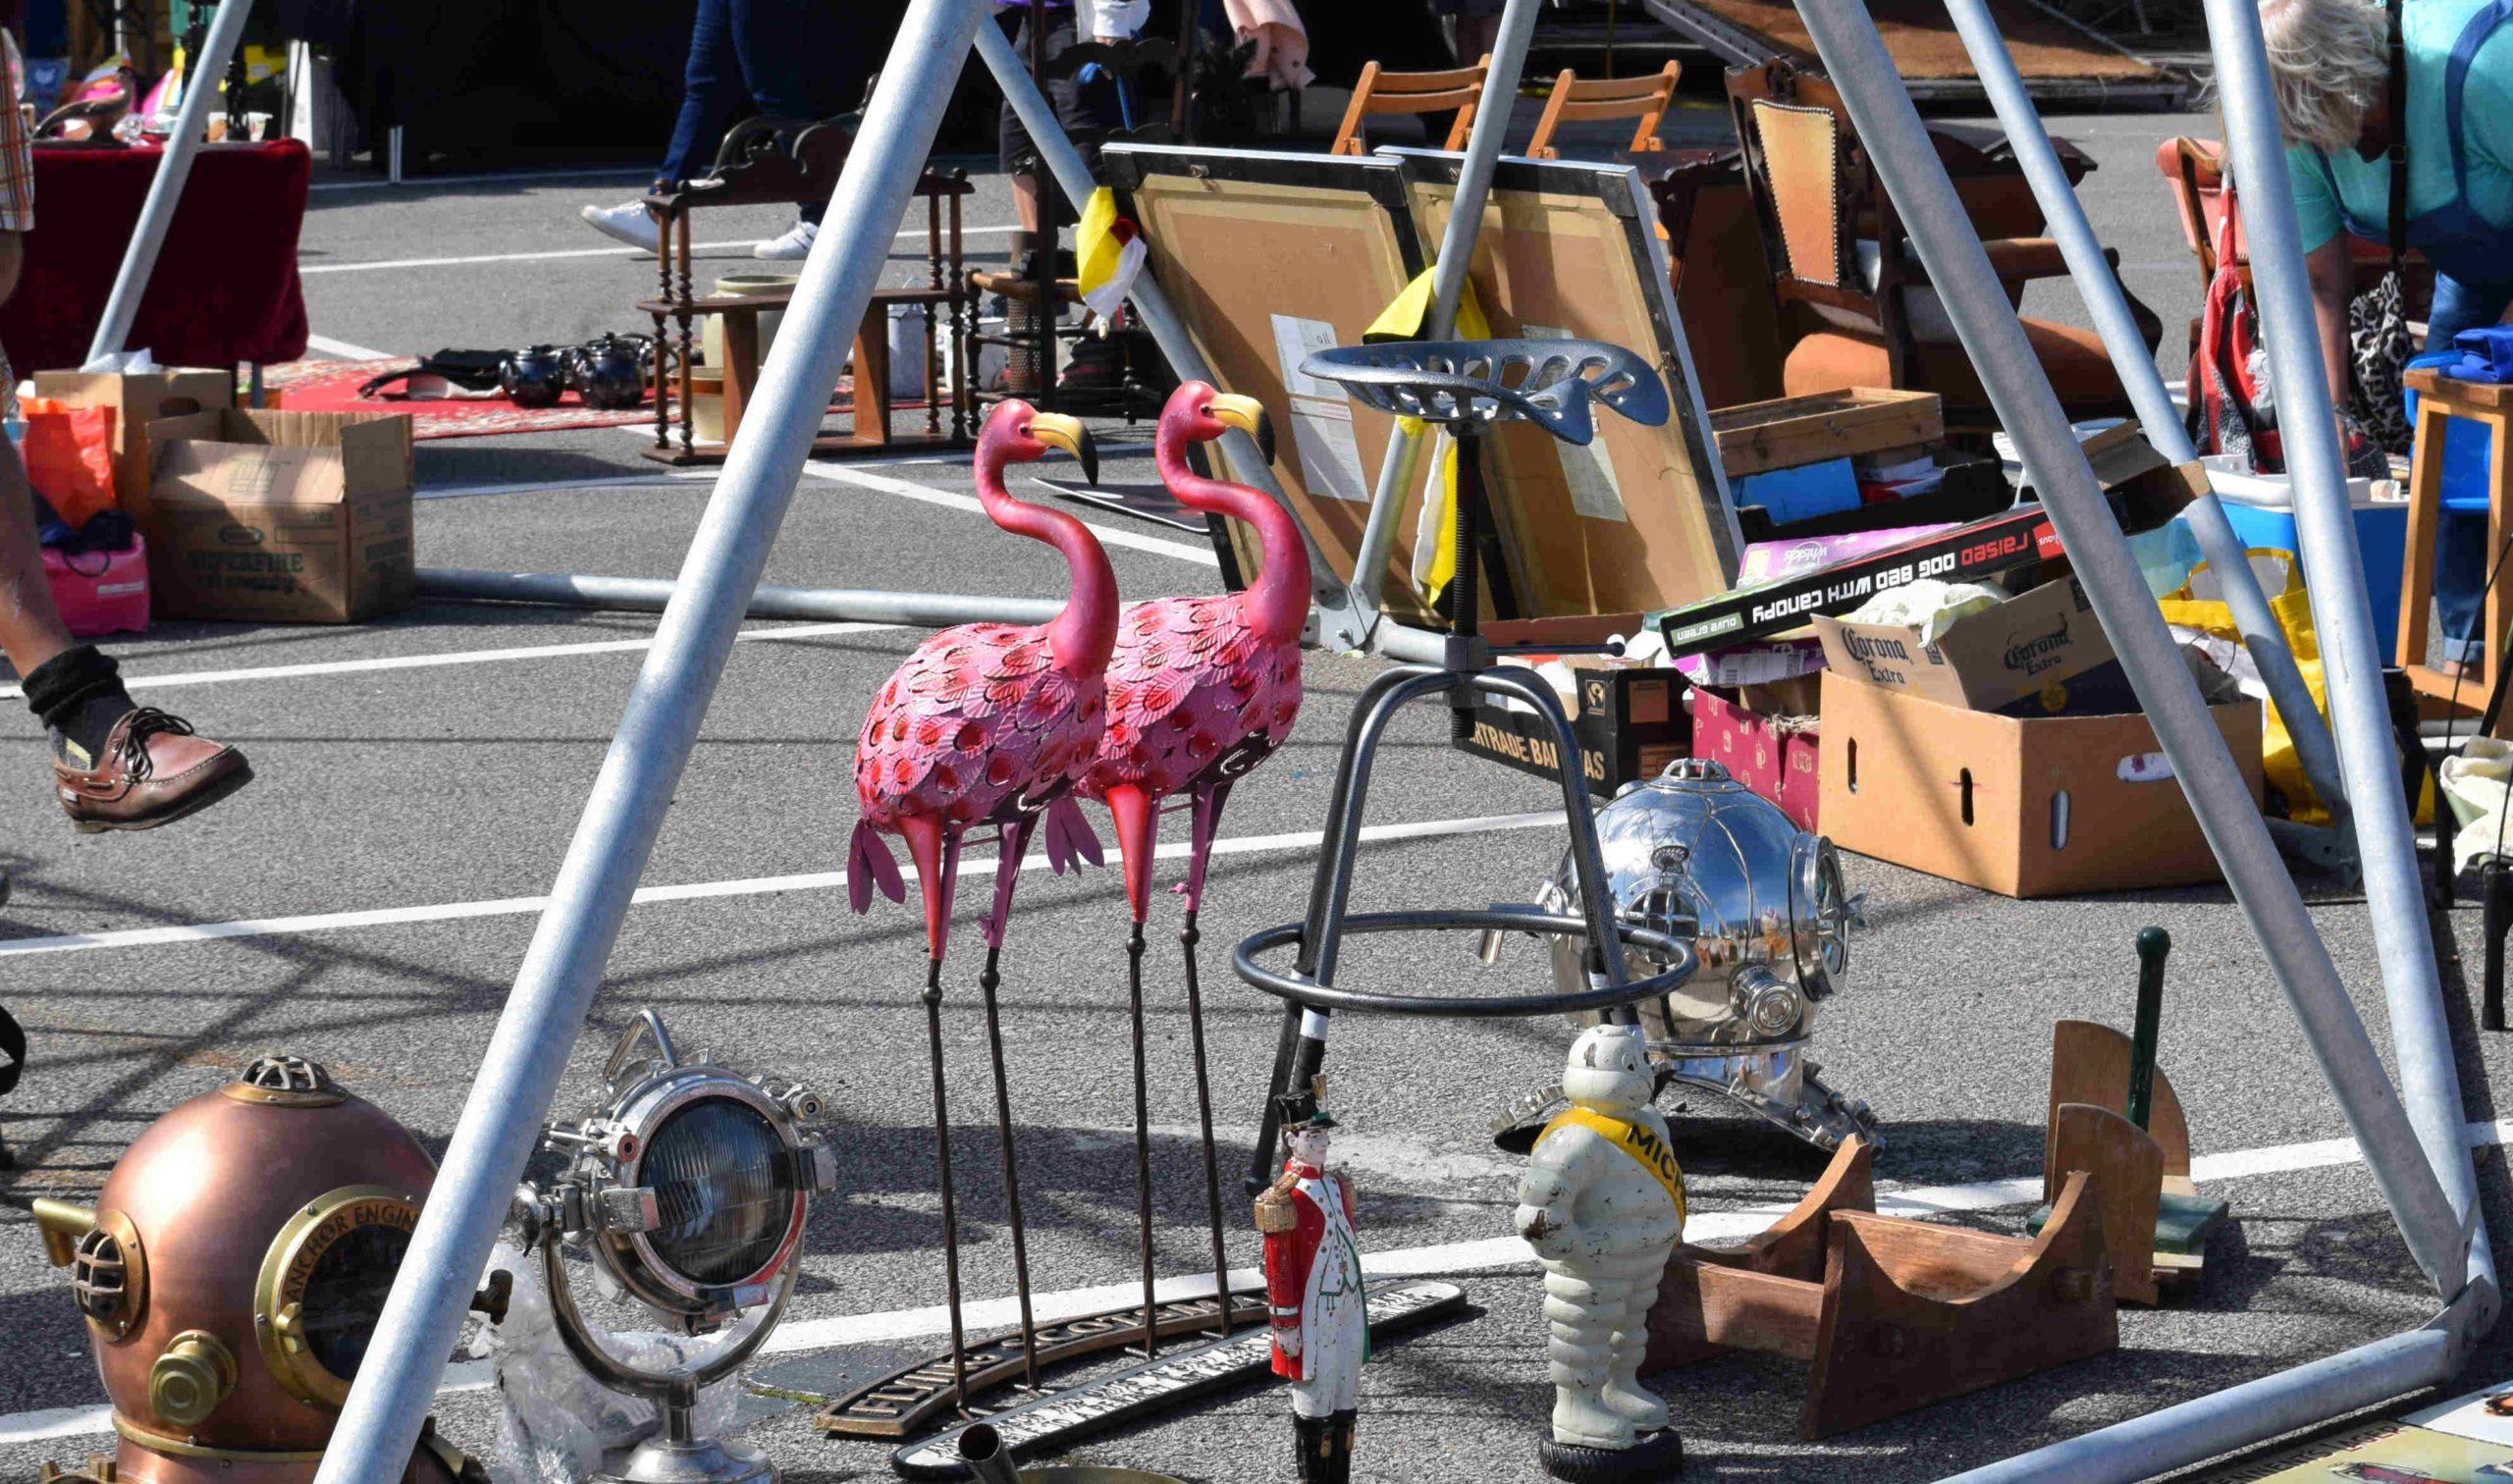 Flamingoes Harbour Marketplace